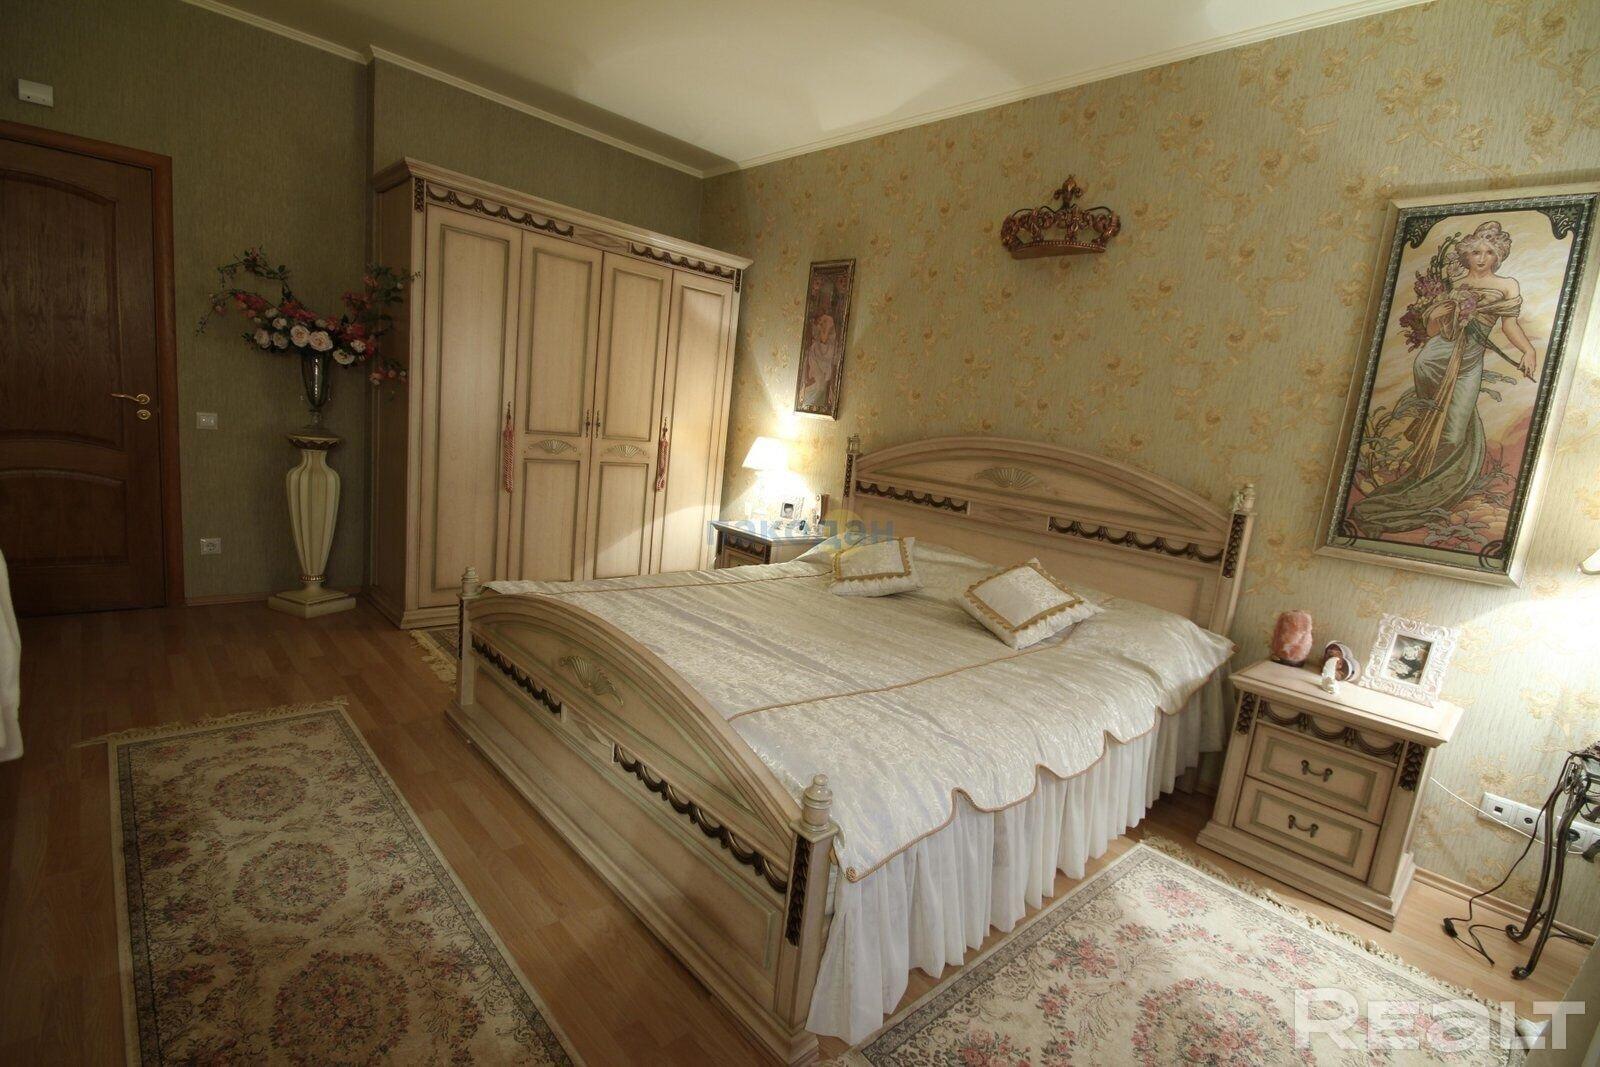 Продается 3-х комнатная квартира, ул. Поселковая 1-я д.39 - фото №13